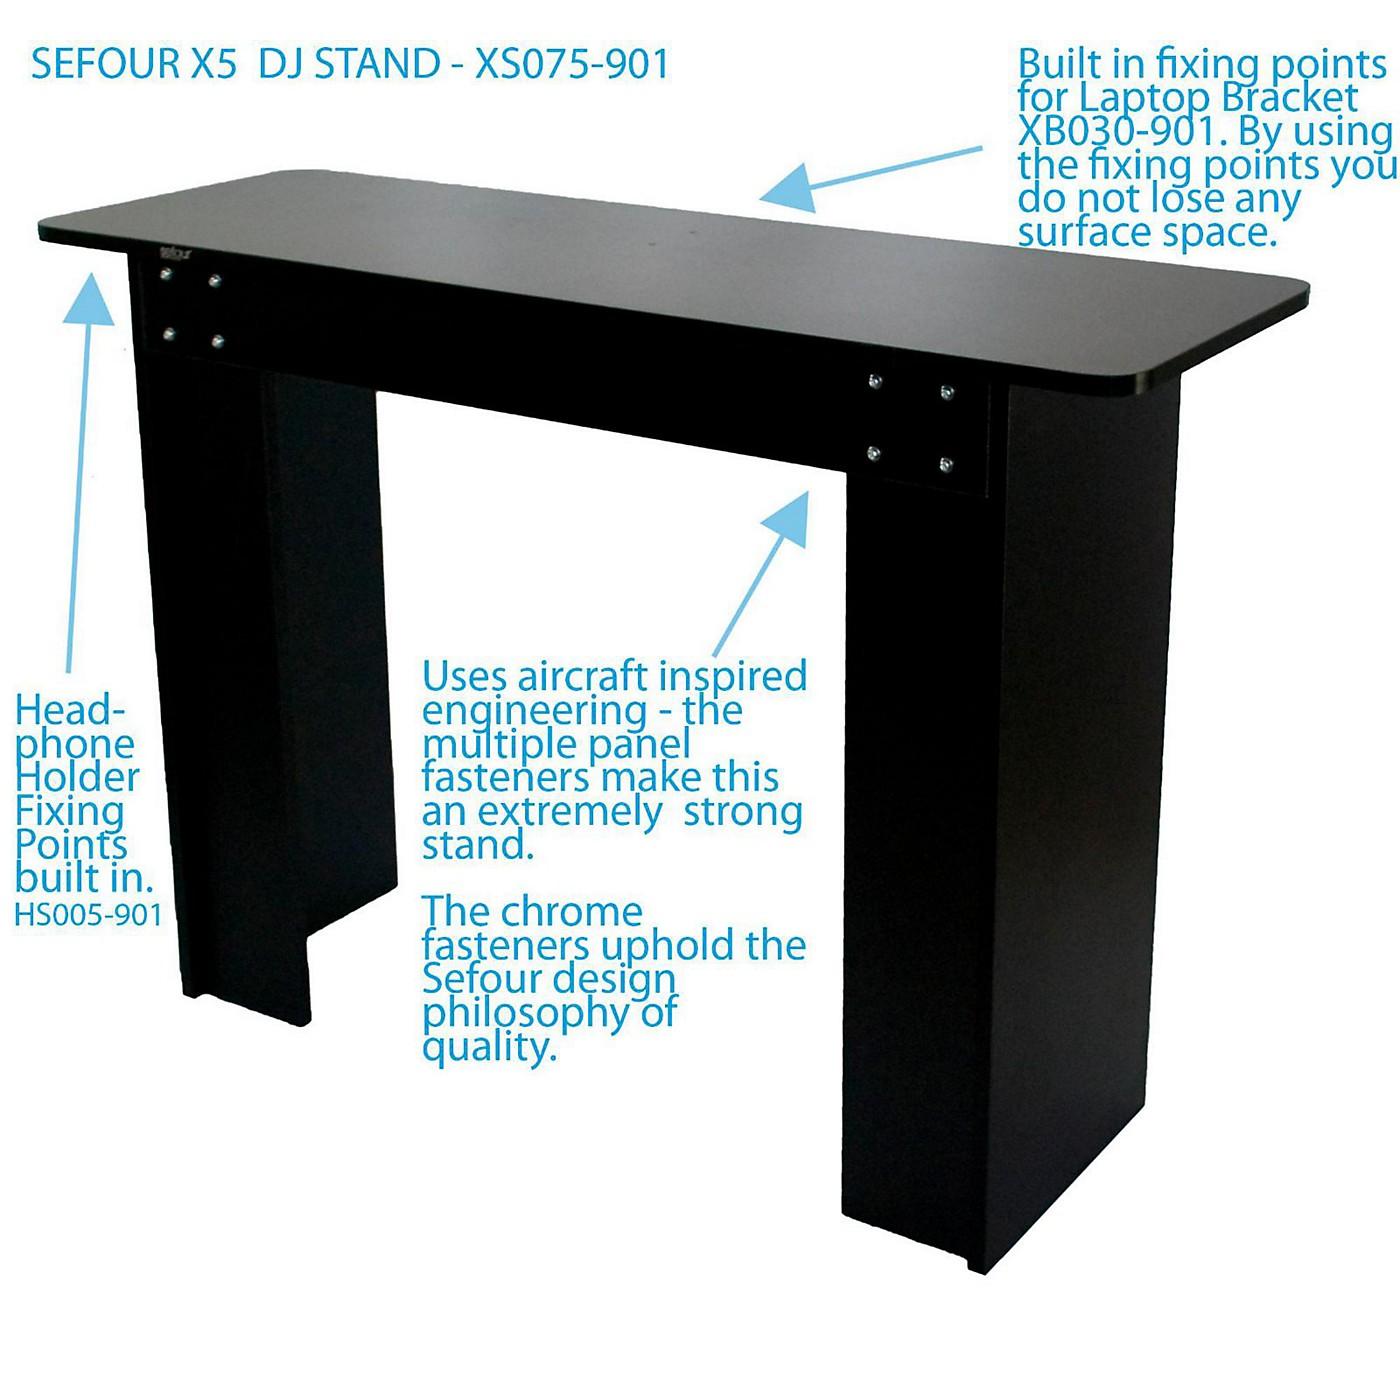 Sefour X5 DJ Stand thumbnail